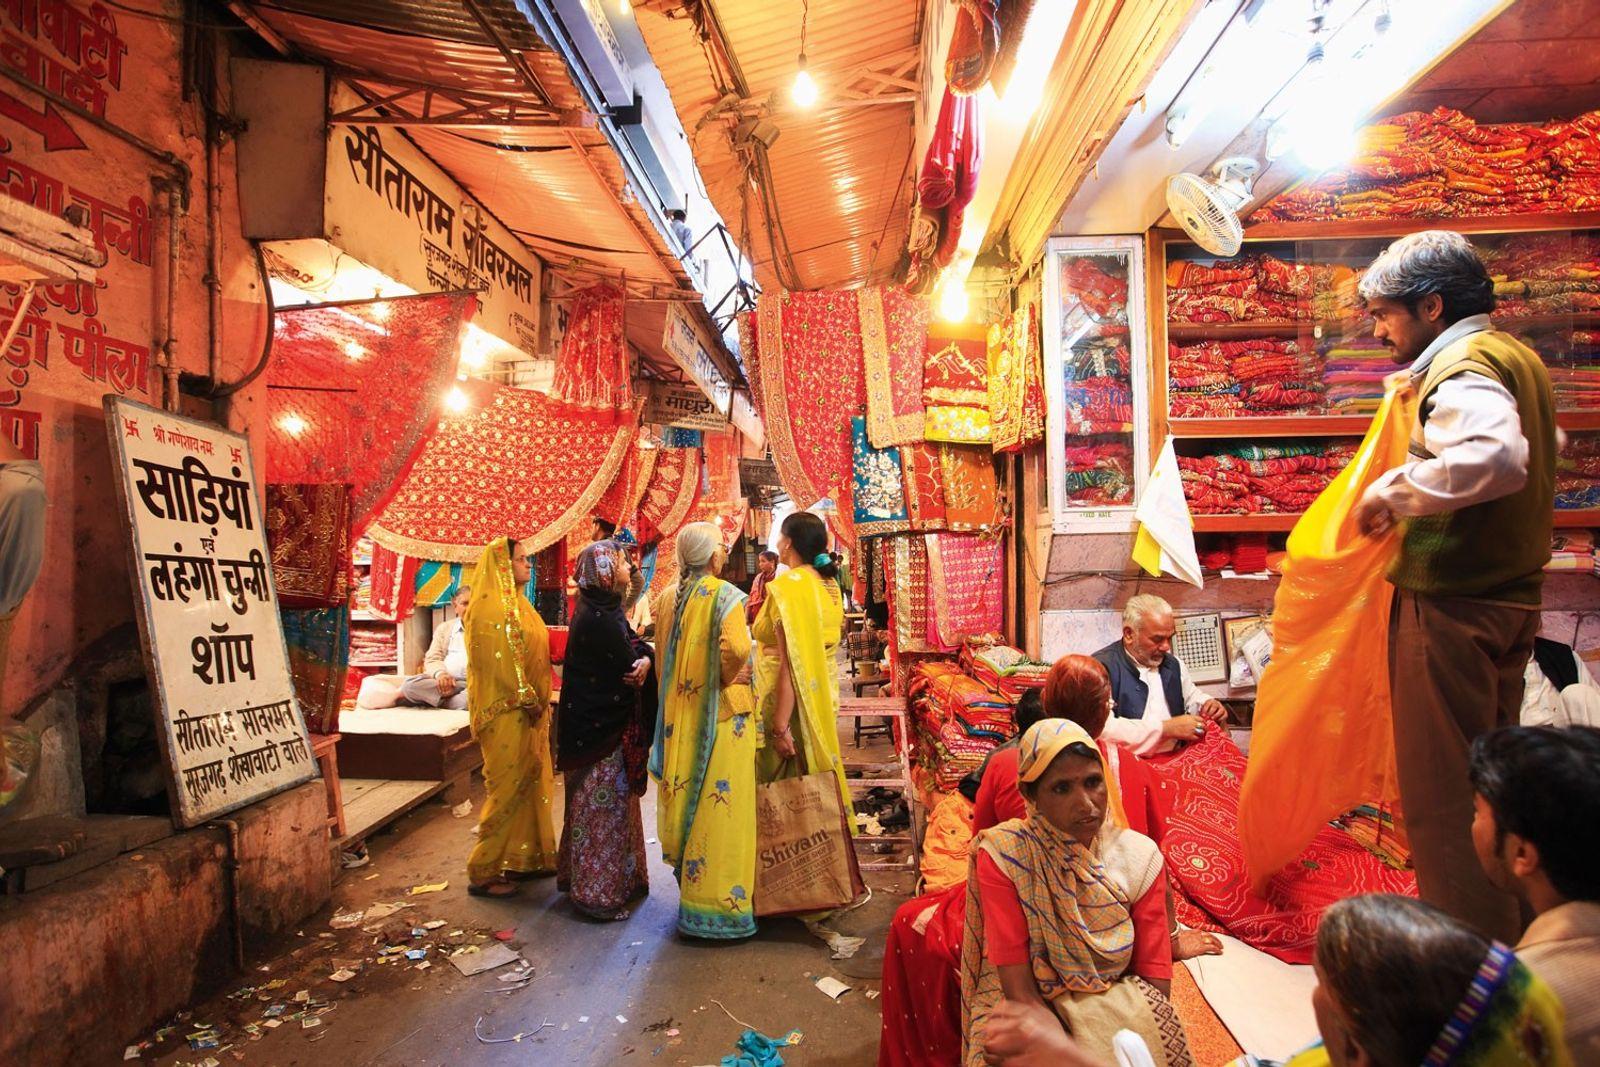 Rite of passage to India